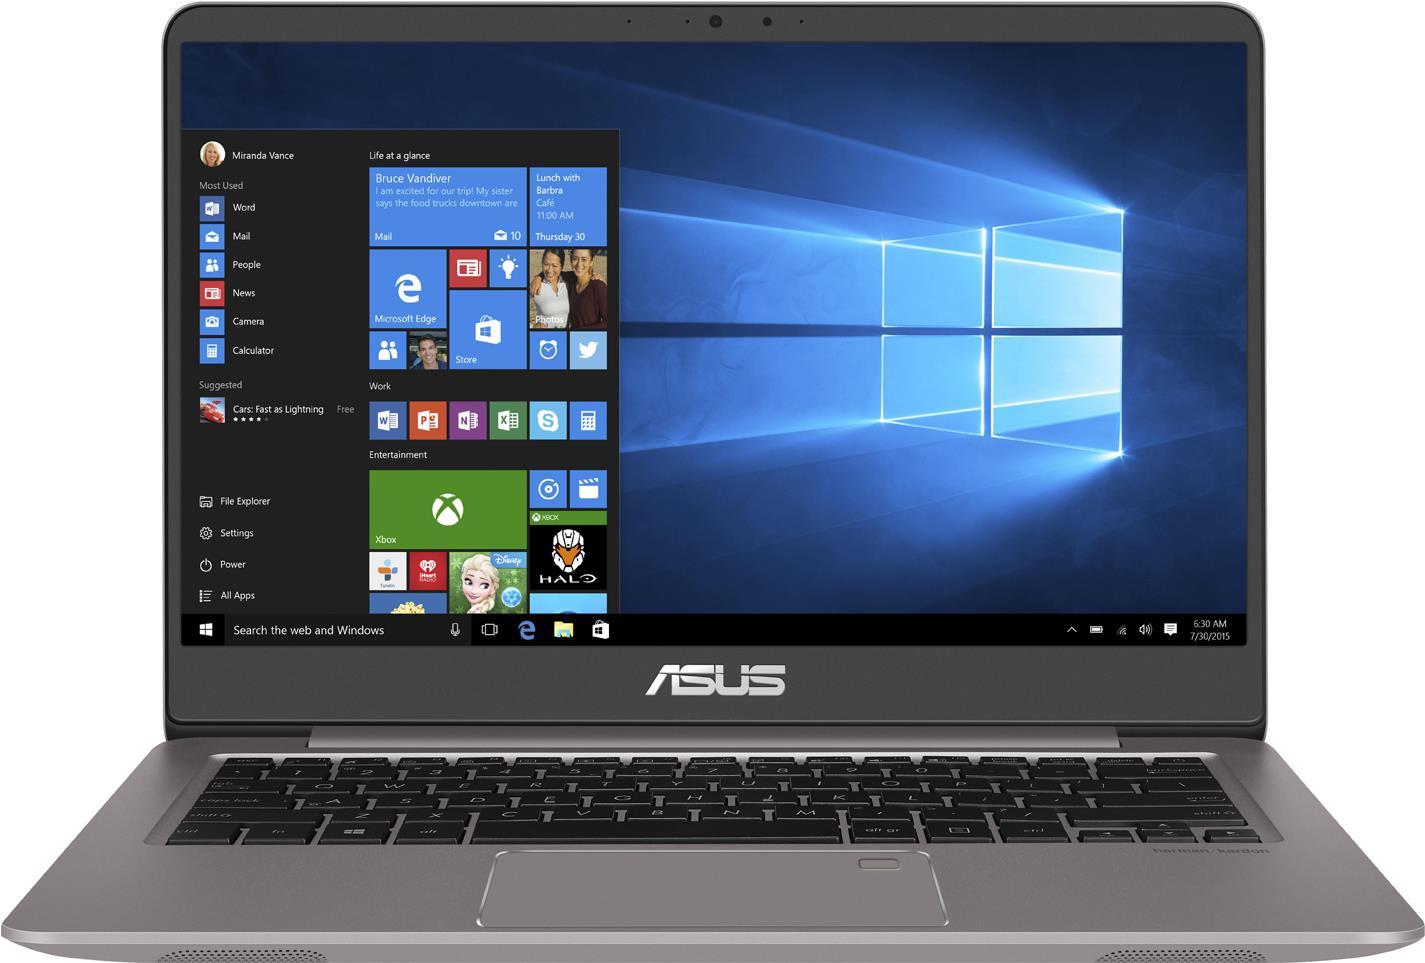 Notebooks, Laptops - Asus Zenbook UX3410UA GV578T Core i7 7500U 2.7 GHz Win 10 Home 64 Bit 16 GB RAM 512 GB SSD 35.6 cm (14) 1920 x 1080 (Full HD) HD Graphics 620 Wi Fi, Bluetooth Quartzgrau (90NB0DL1 M04500)  - Onlineshop JACOB Elektronik